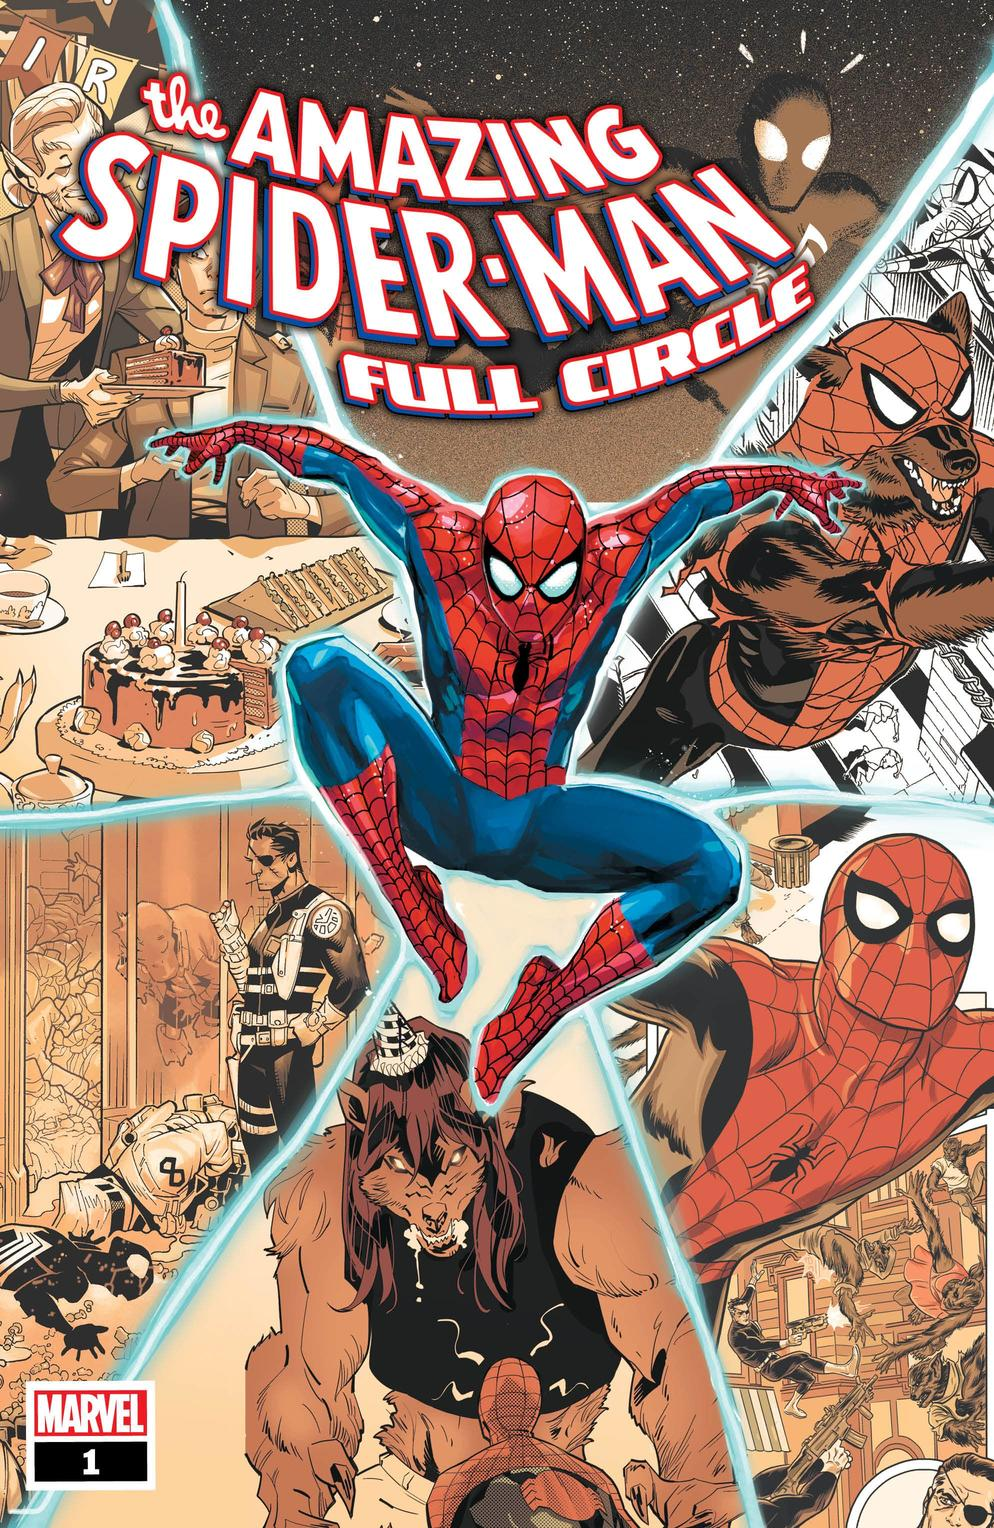 Amazing Spider-Man: Full Circle #1, copertina di Rod Reis